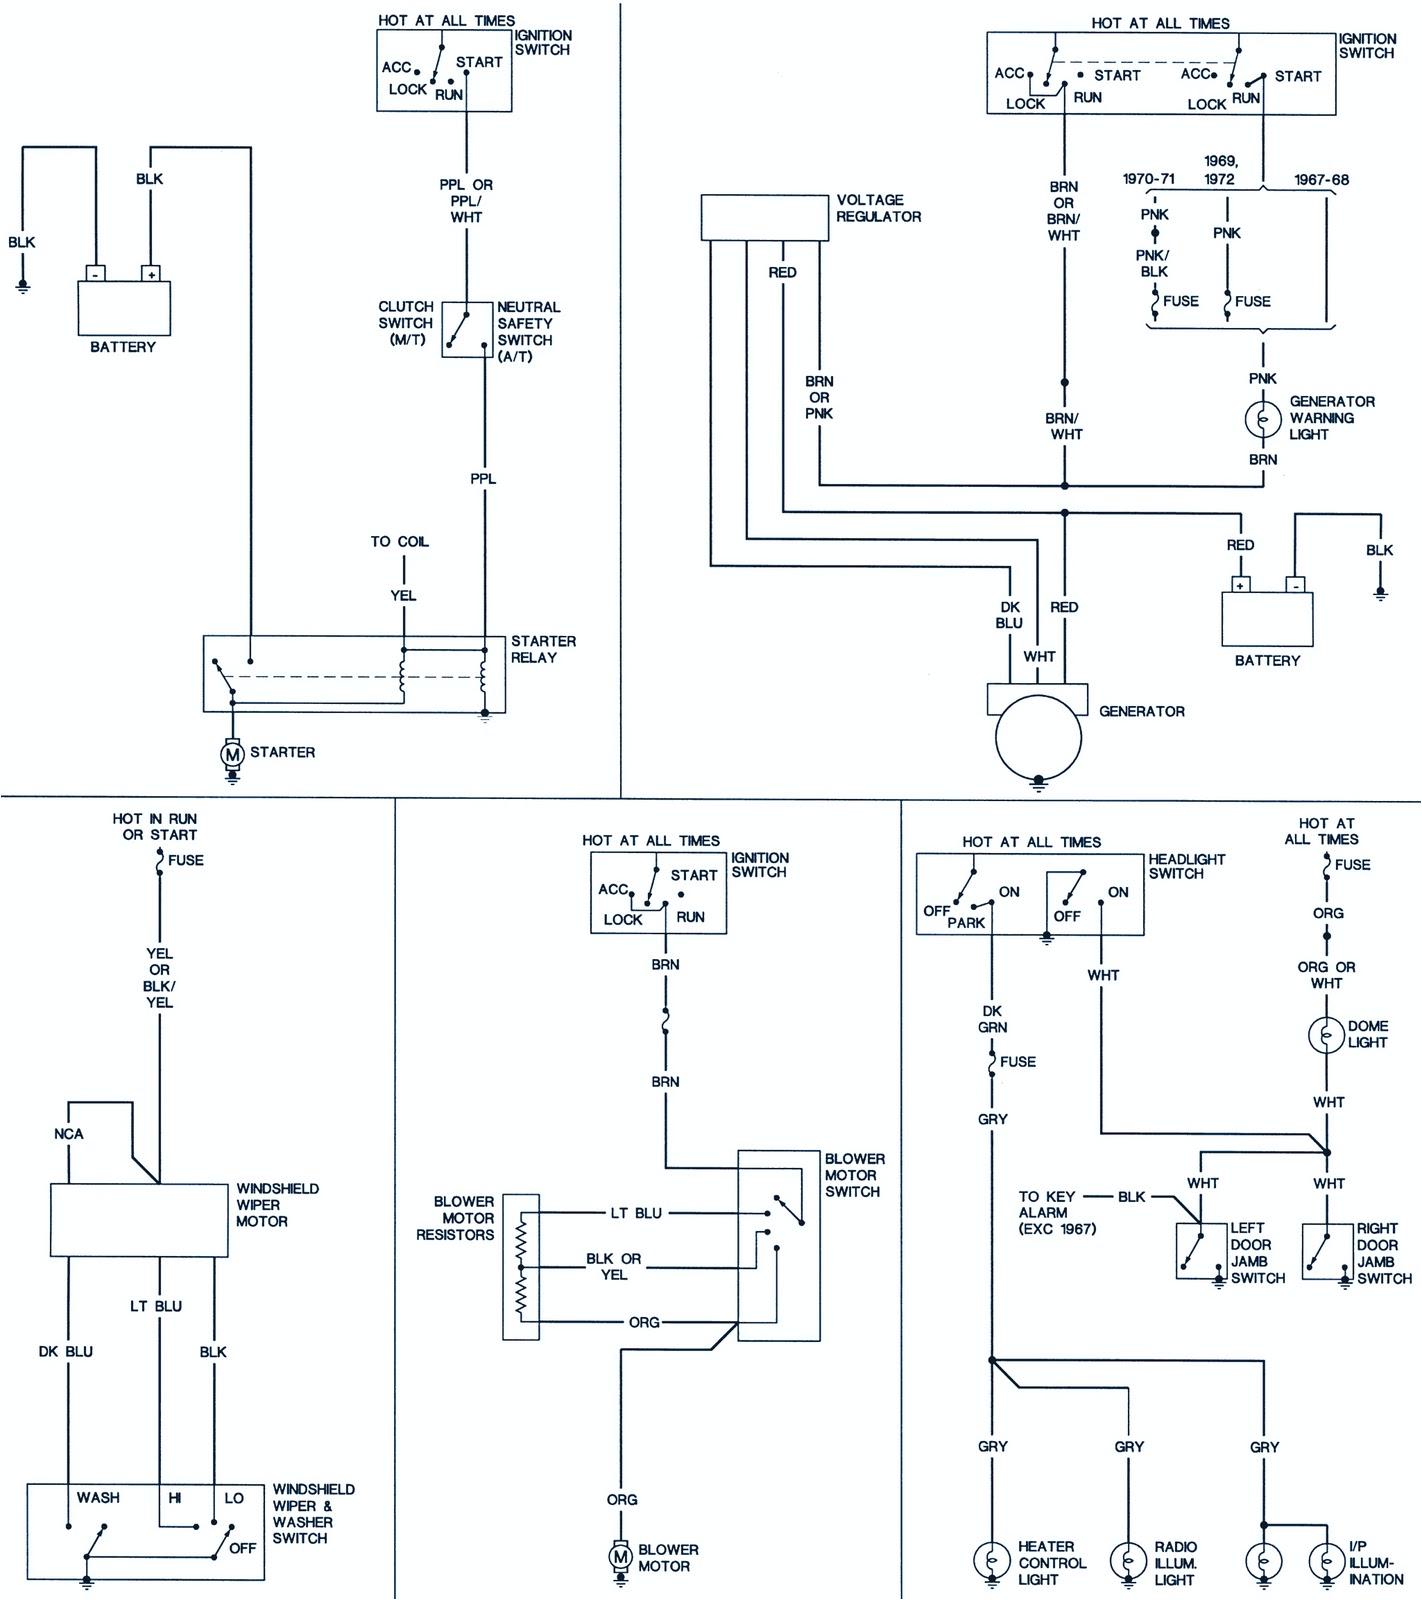 68 camaro ignition switch wiring diagram wiring diagram description 68 camaro ignition wiring harness diagram